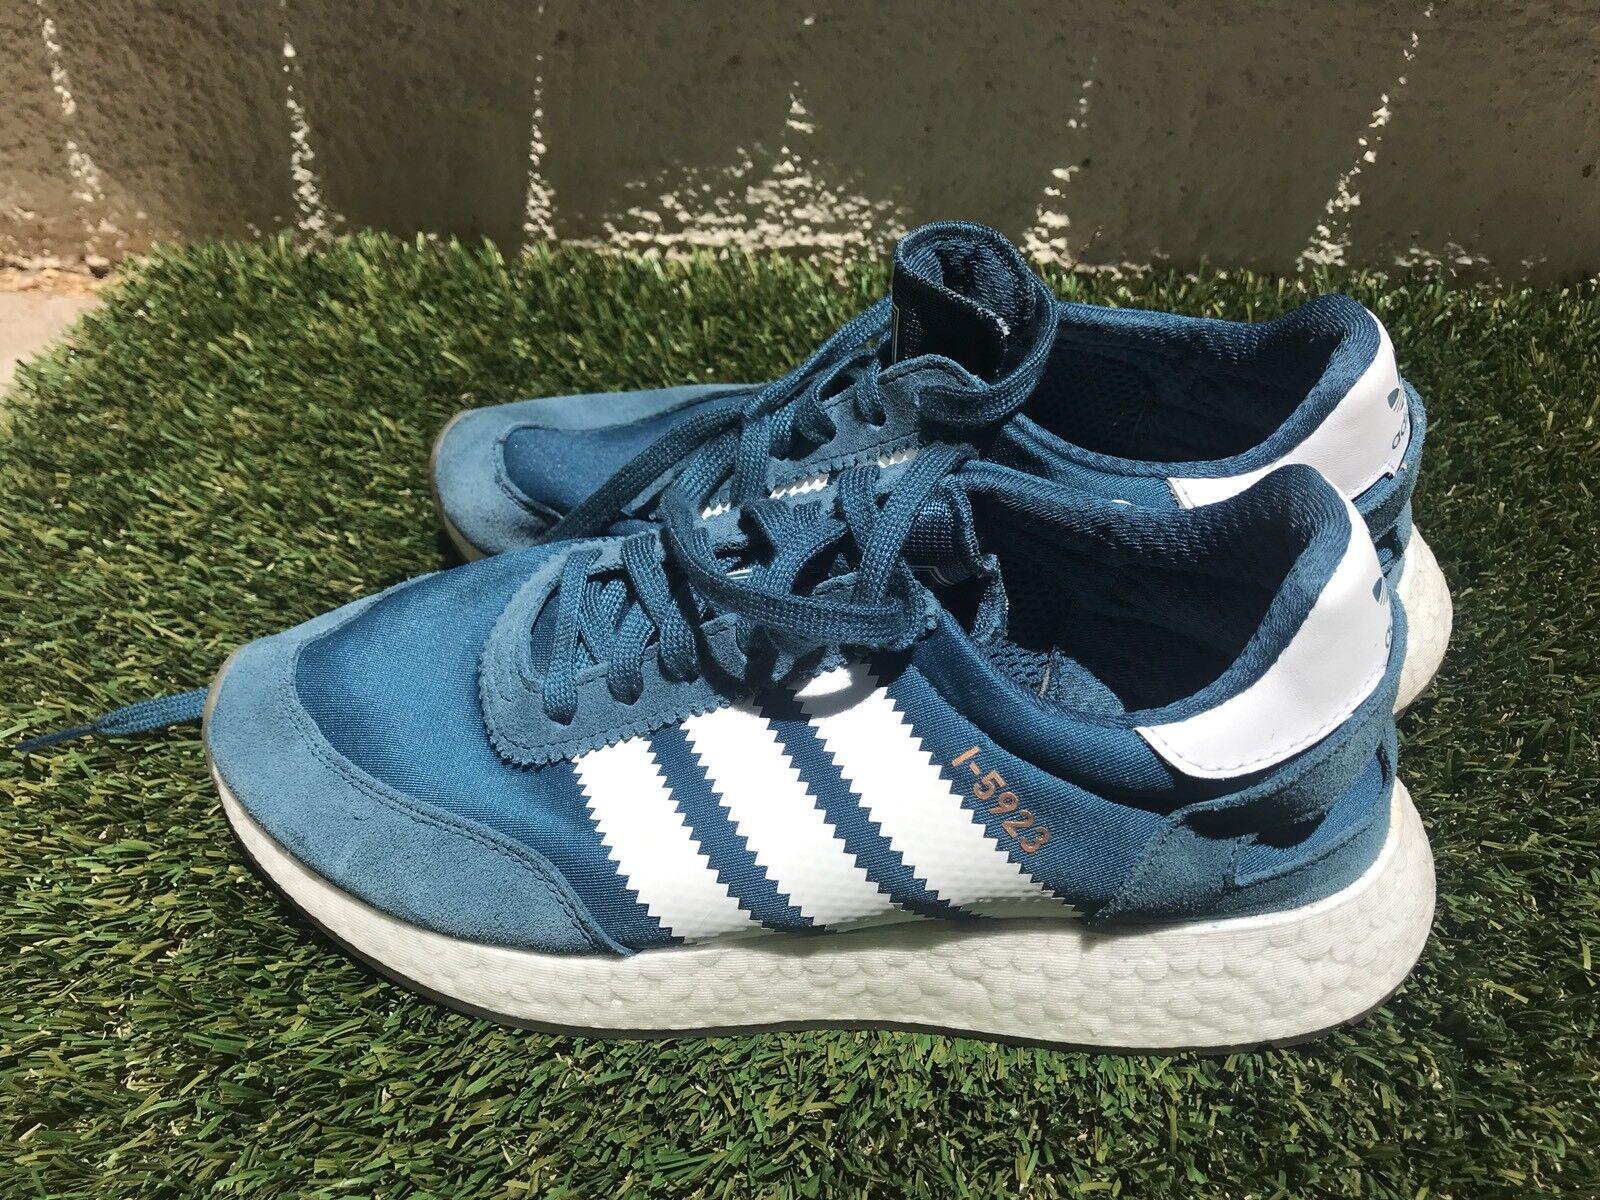 Damens's Adidas I 5923 Sneakers Größe 8.5 8.5 8.5 08c62d